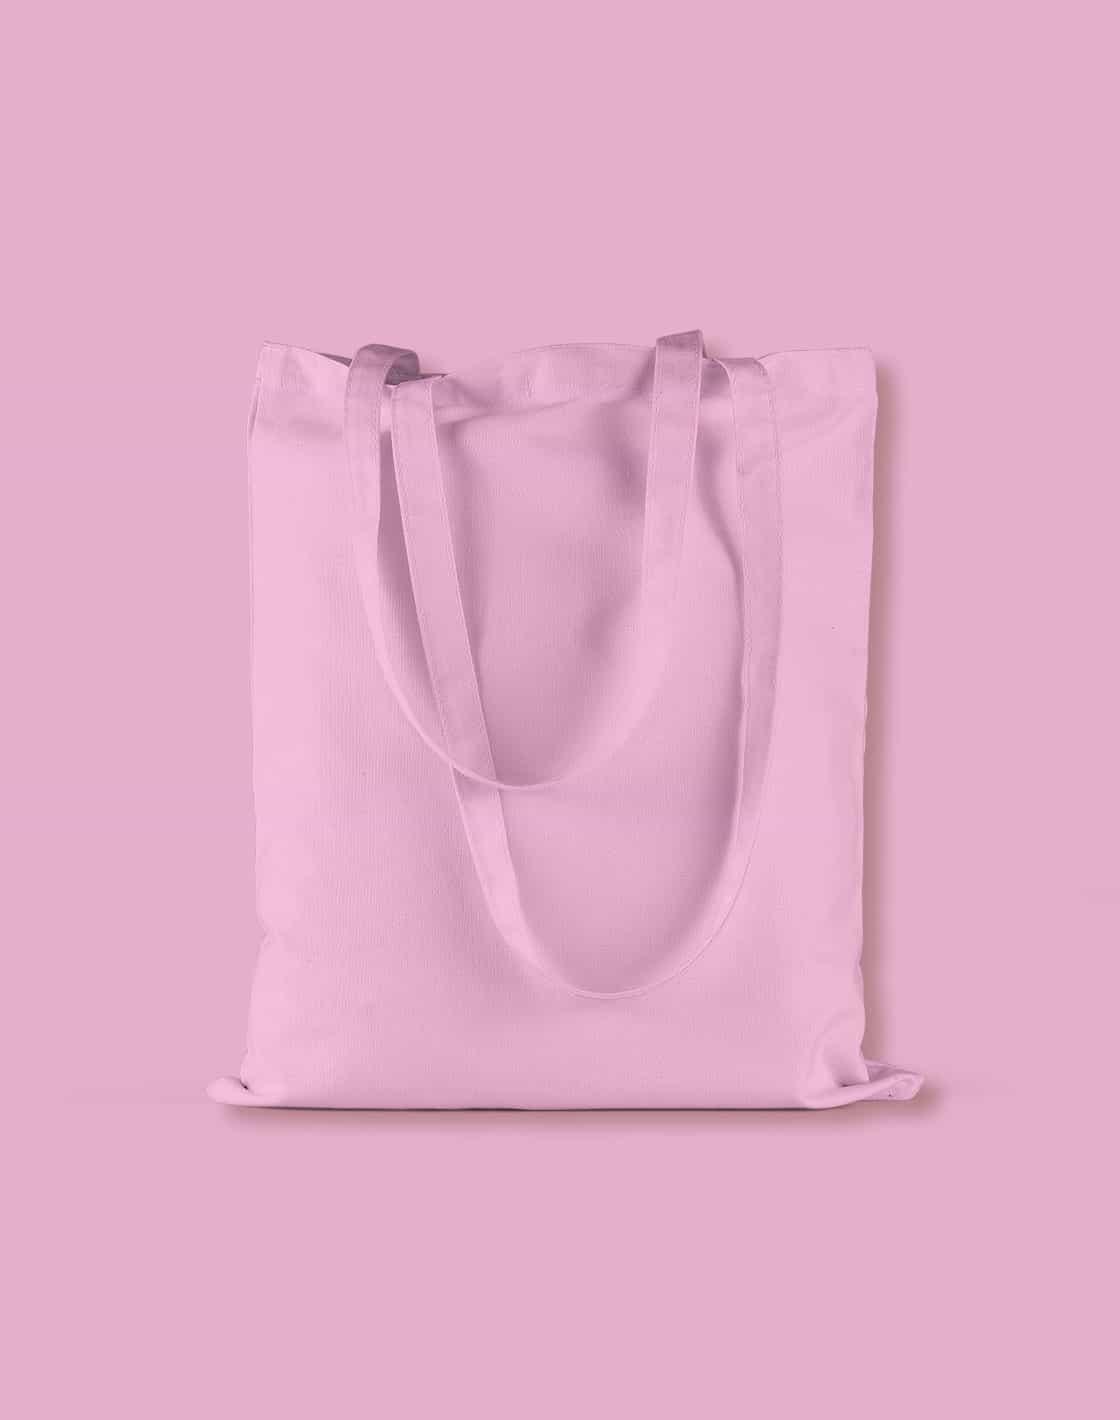 baumwolltaschen bunt classic pink lange henkel 38x42cm